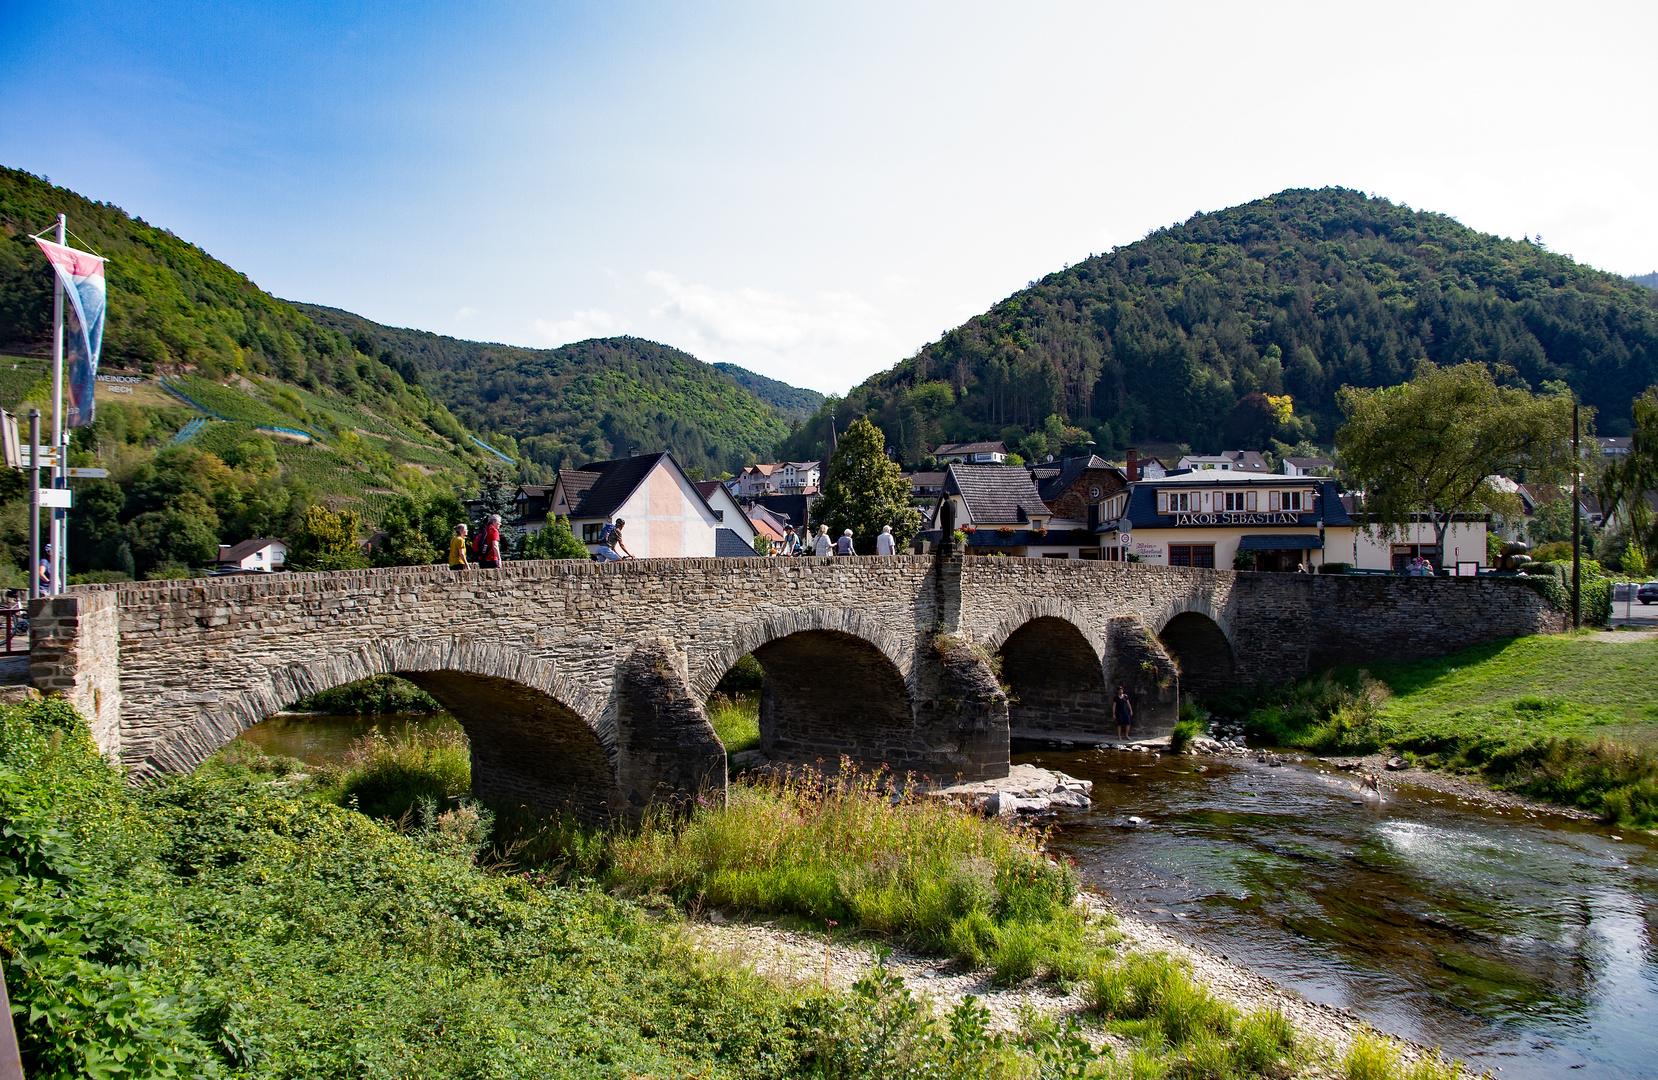 Die Nepomuk-Brücke in Rech